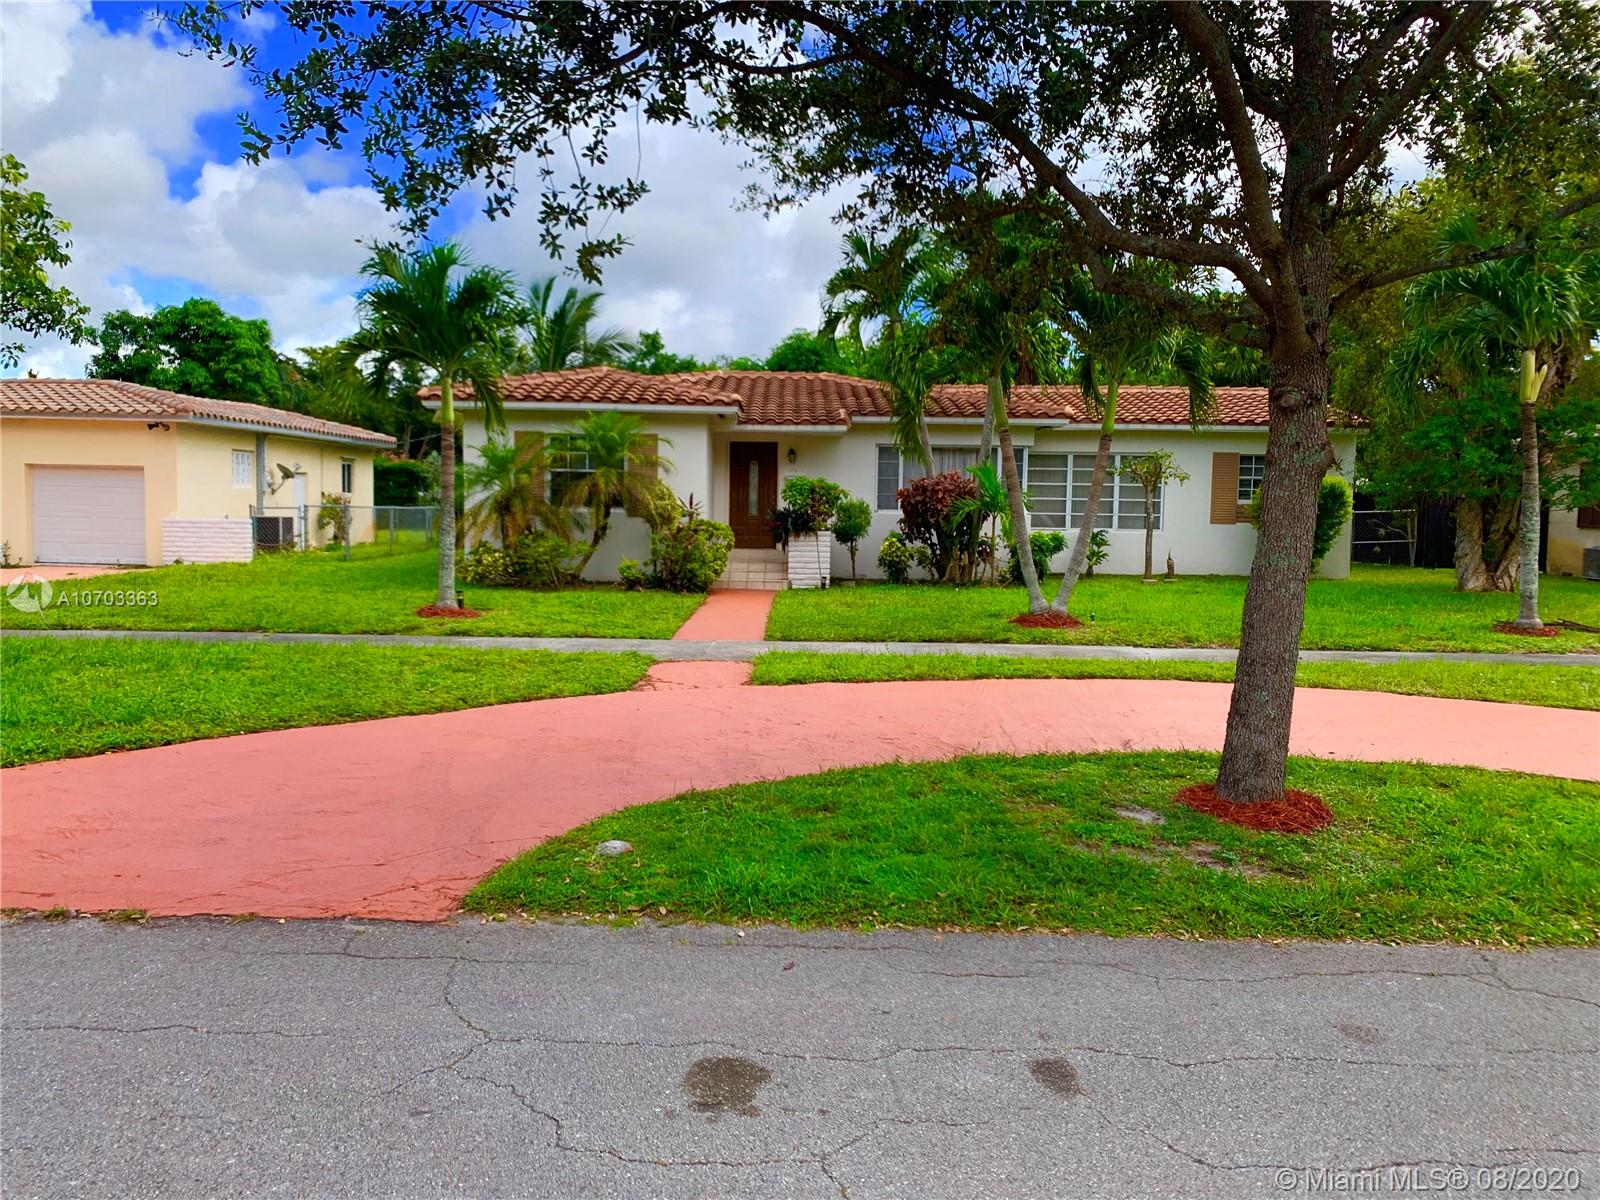 174 NW 108th St, Miami Shores, Florida